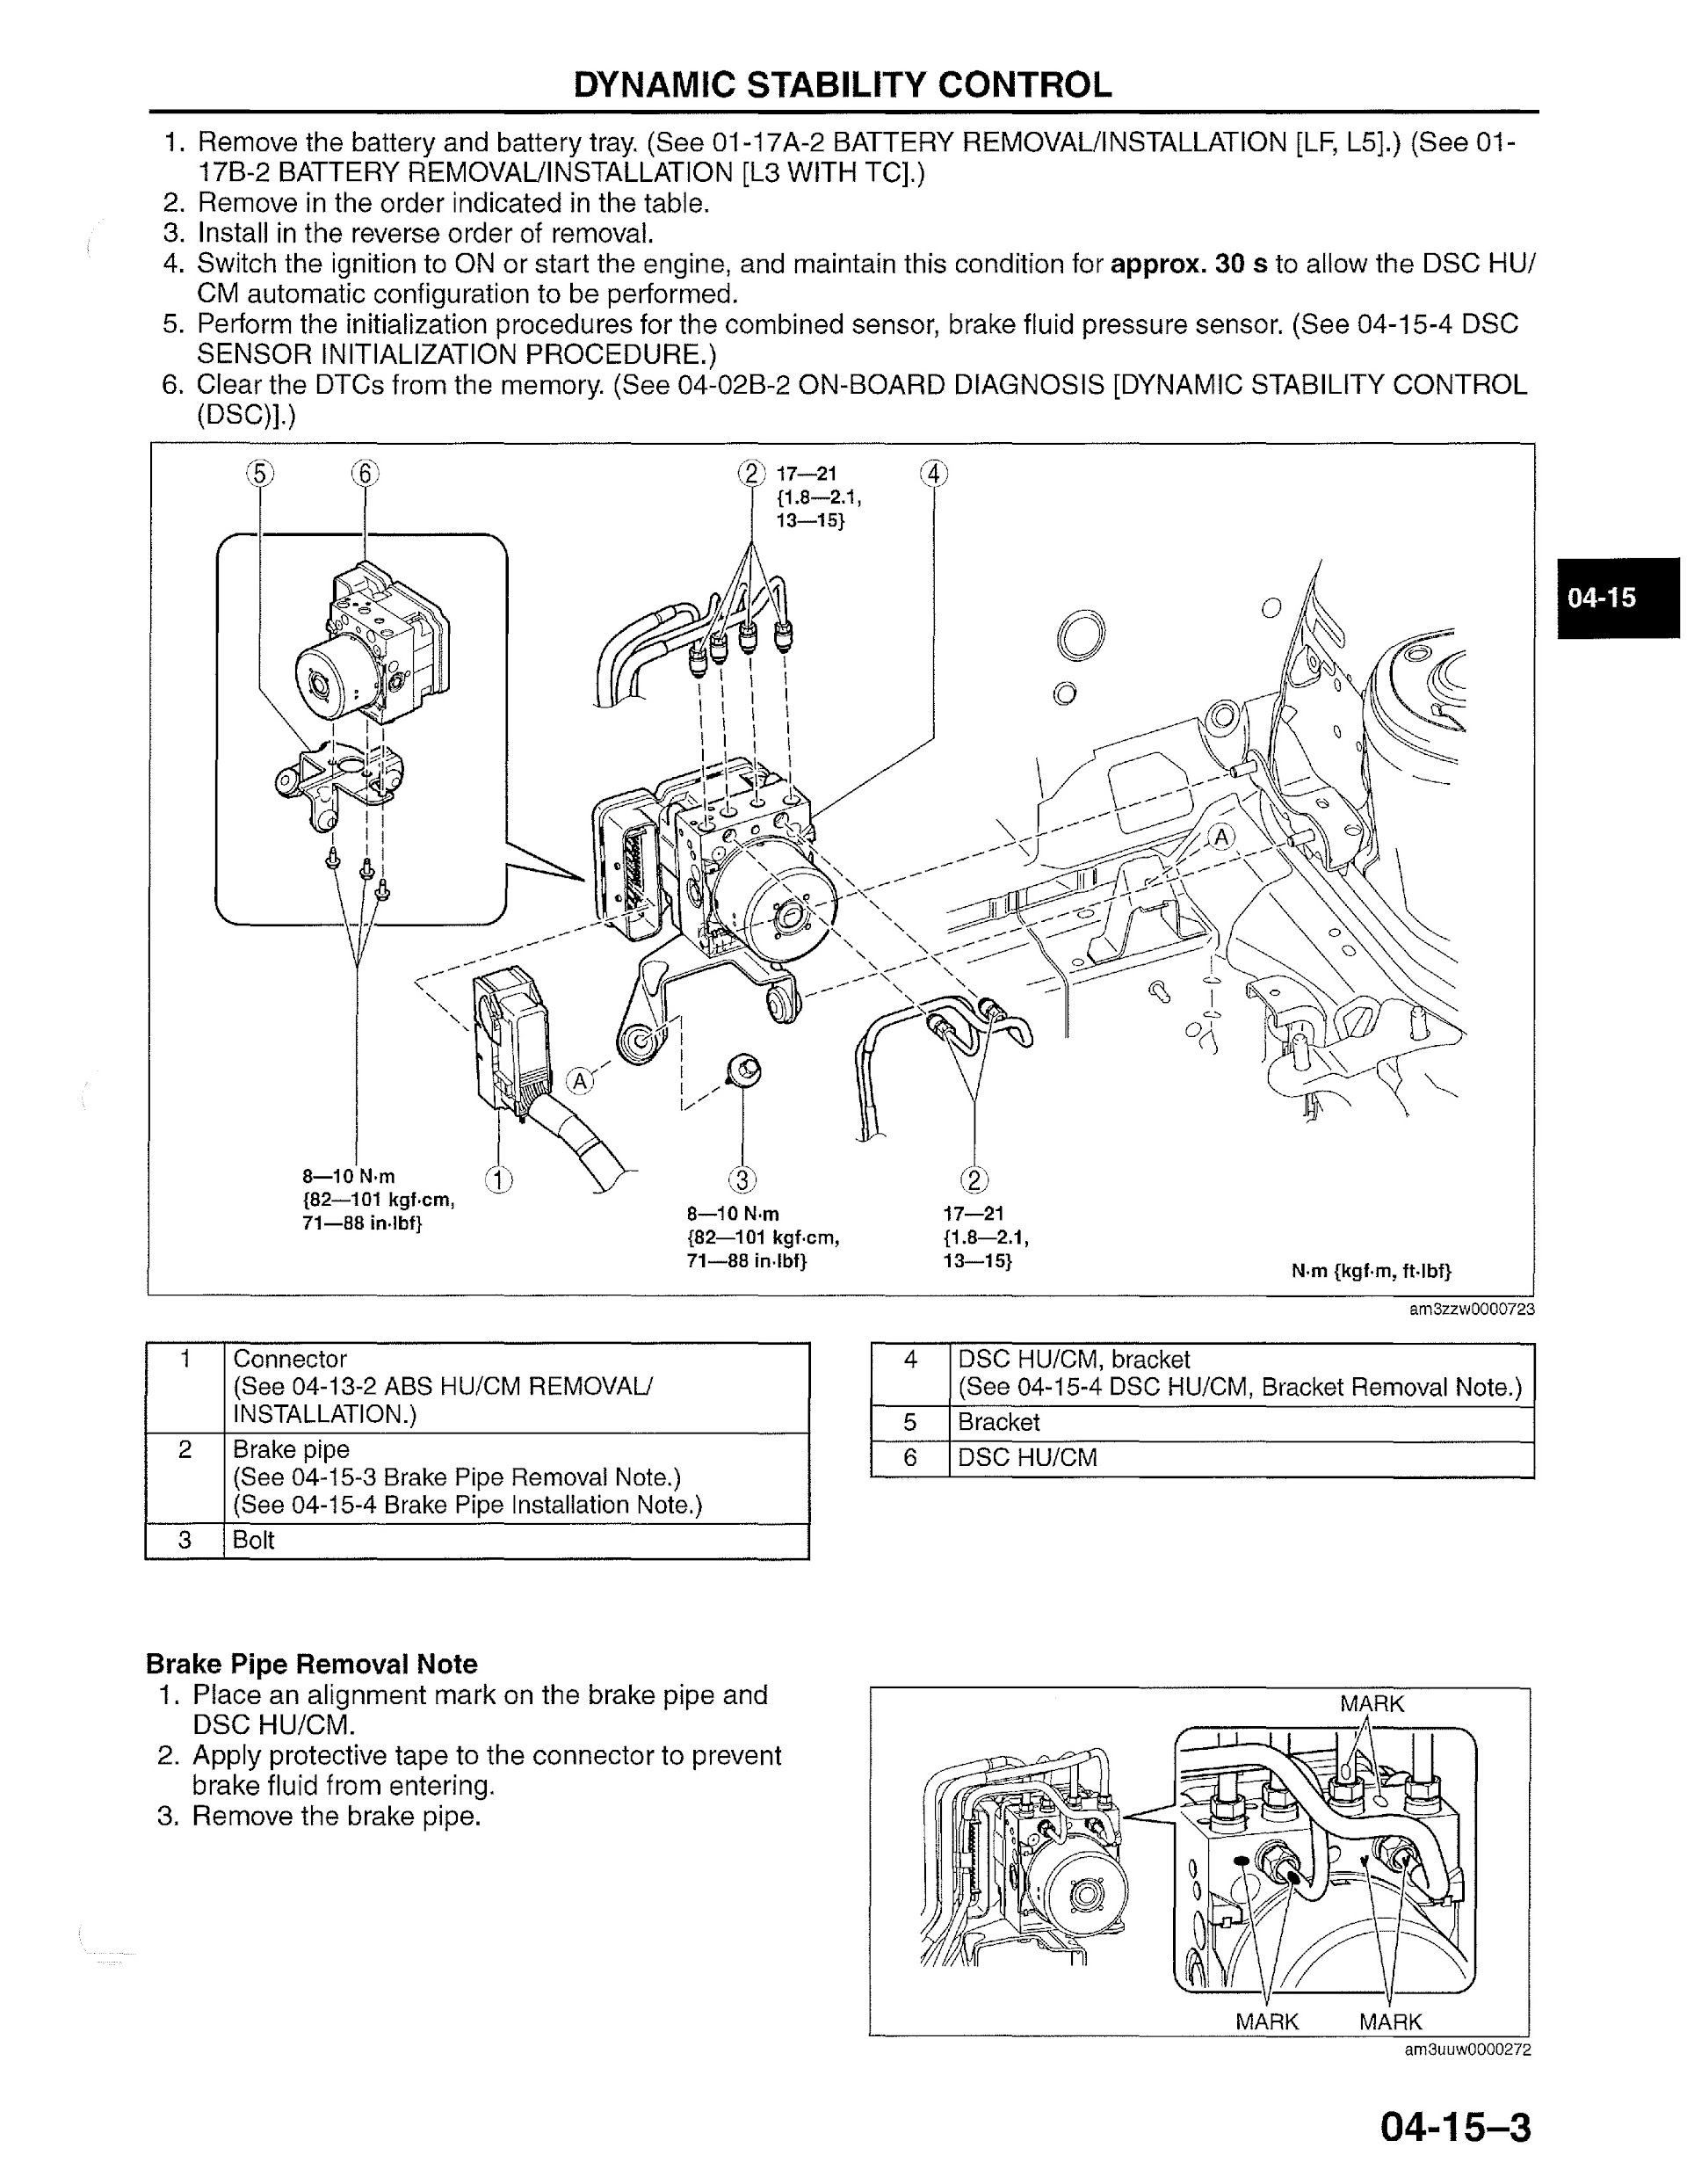 2010 mazda 3 service manual pdf free